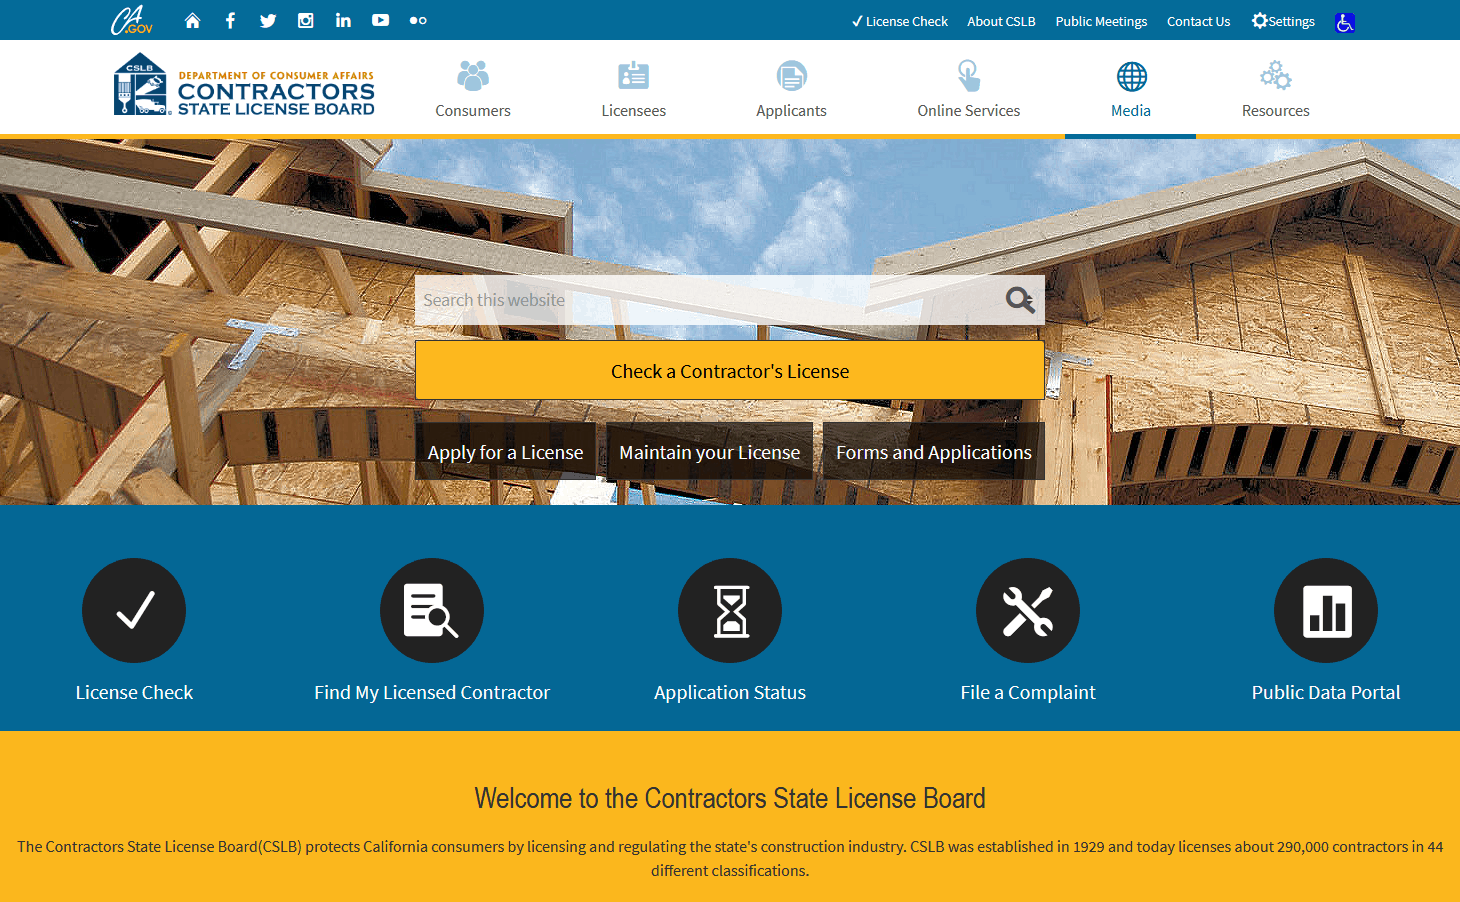 CSLB Website